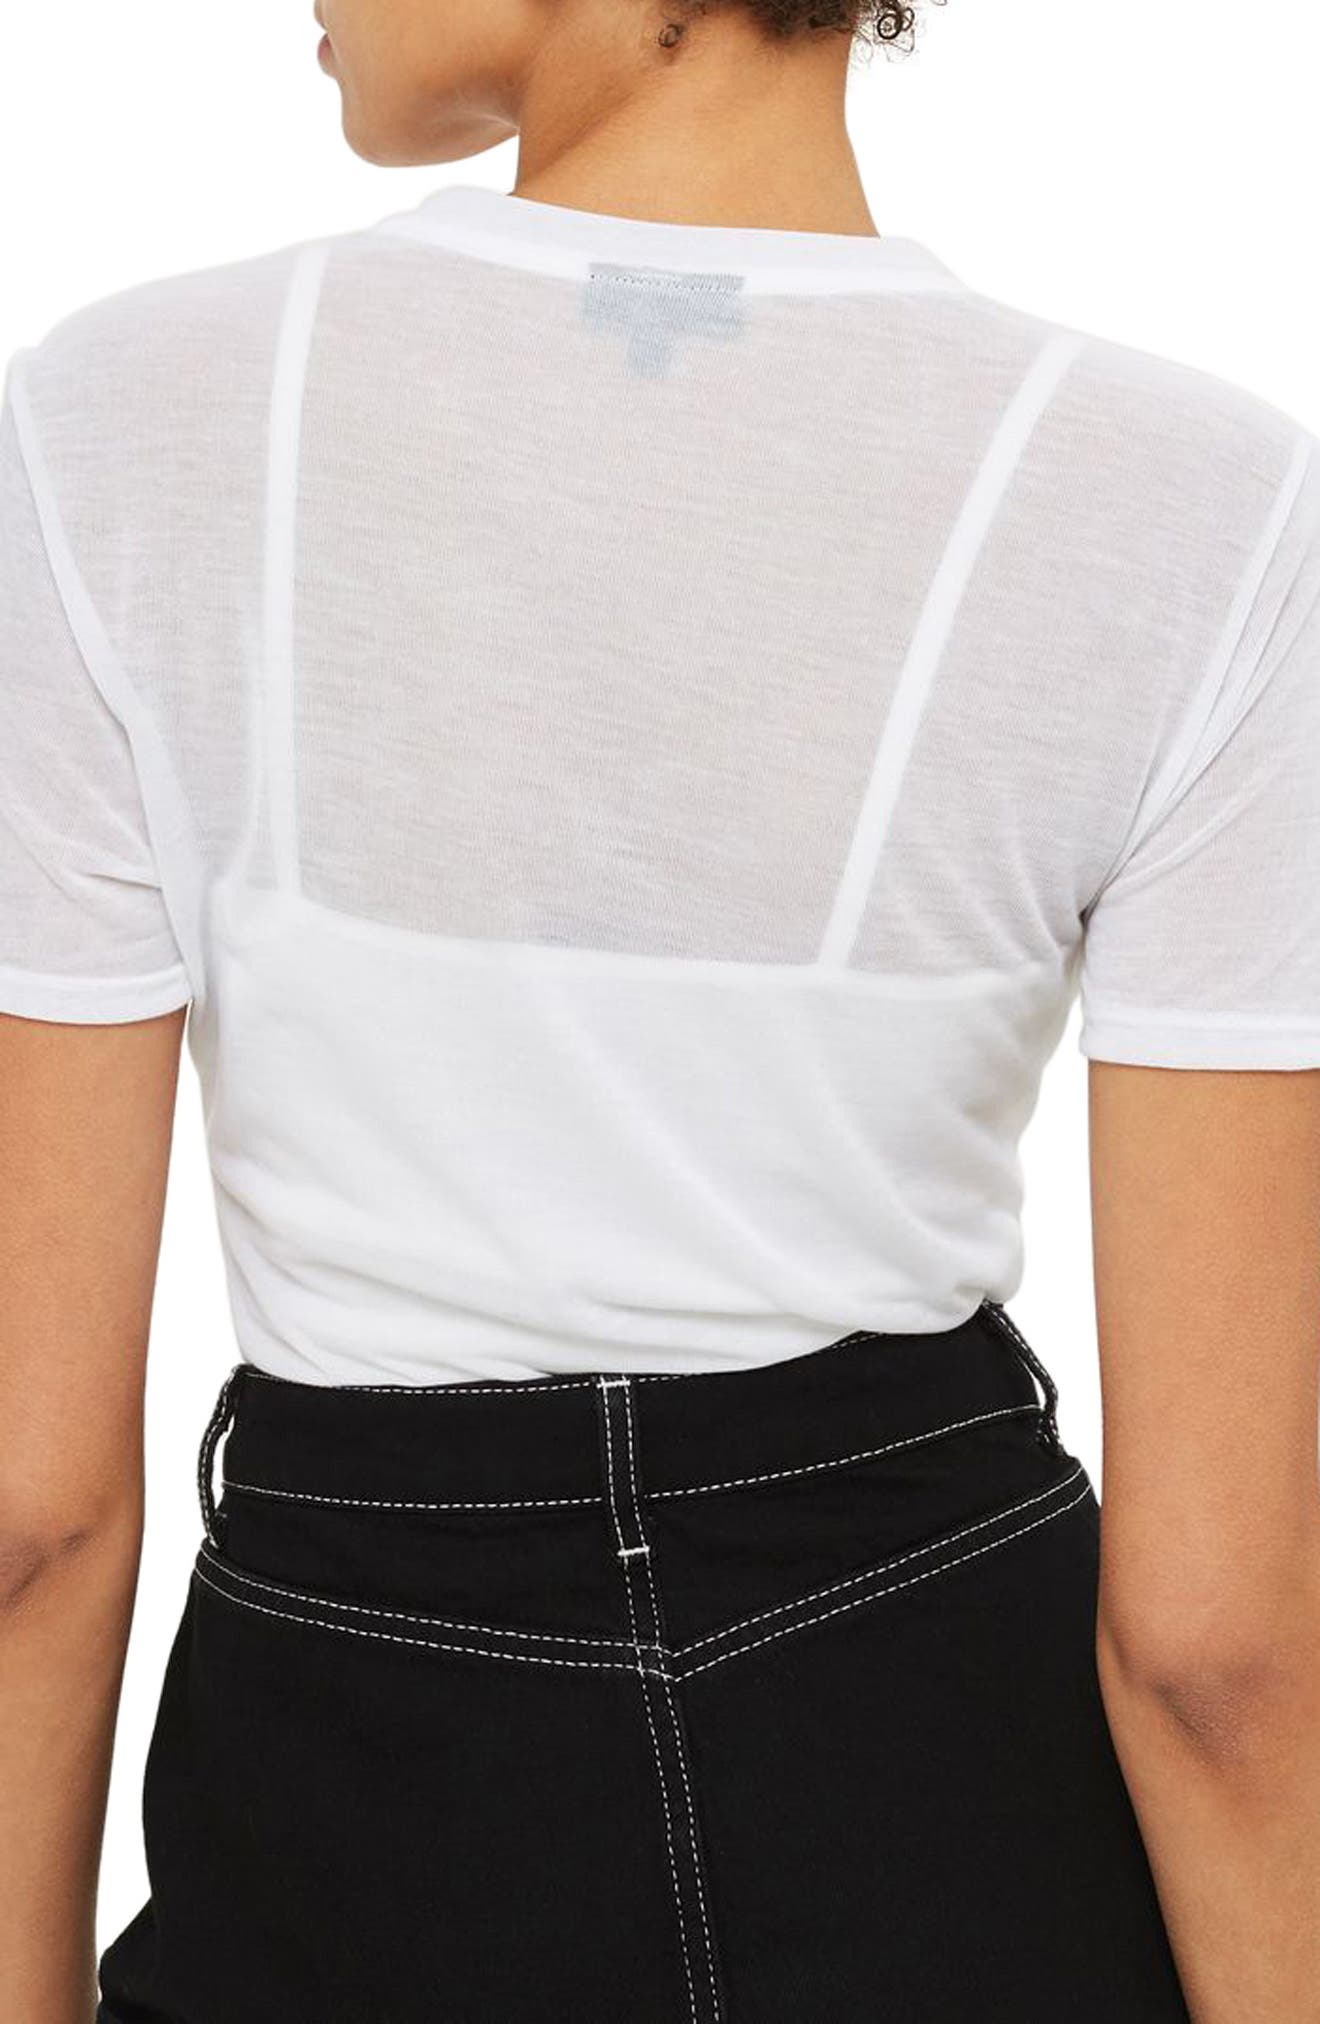 Alternate Image 3  - Topshop Sheer T-Shirt Bodysuit